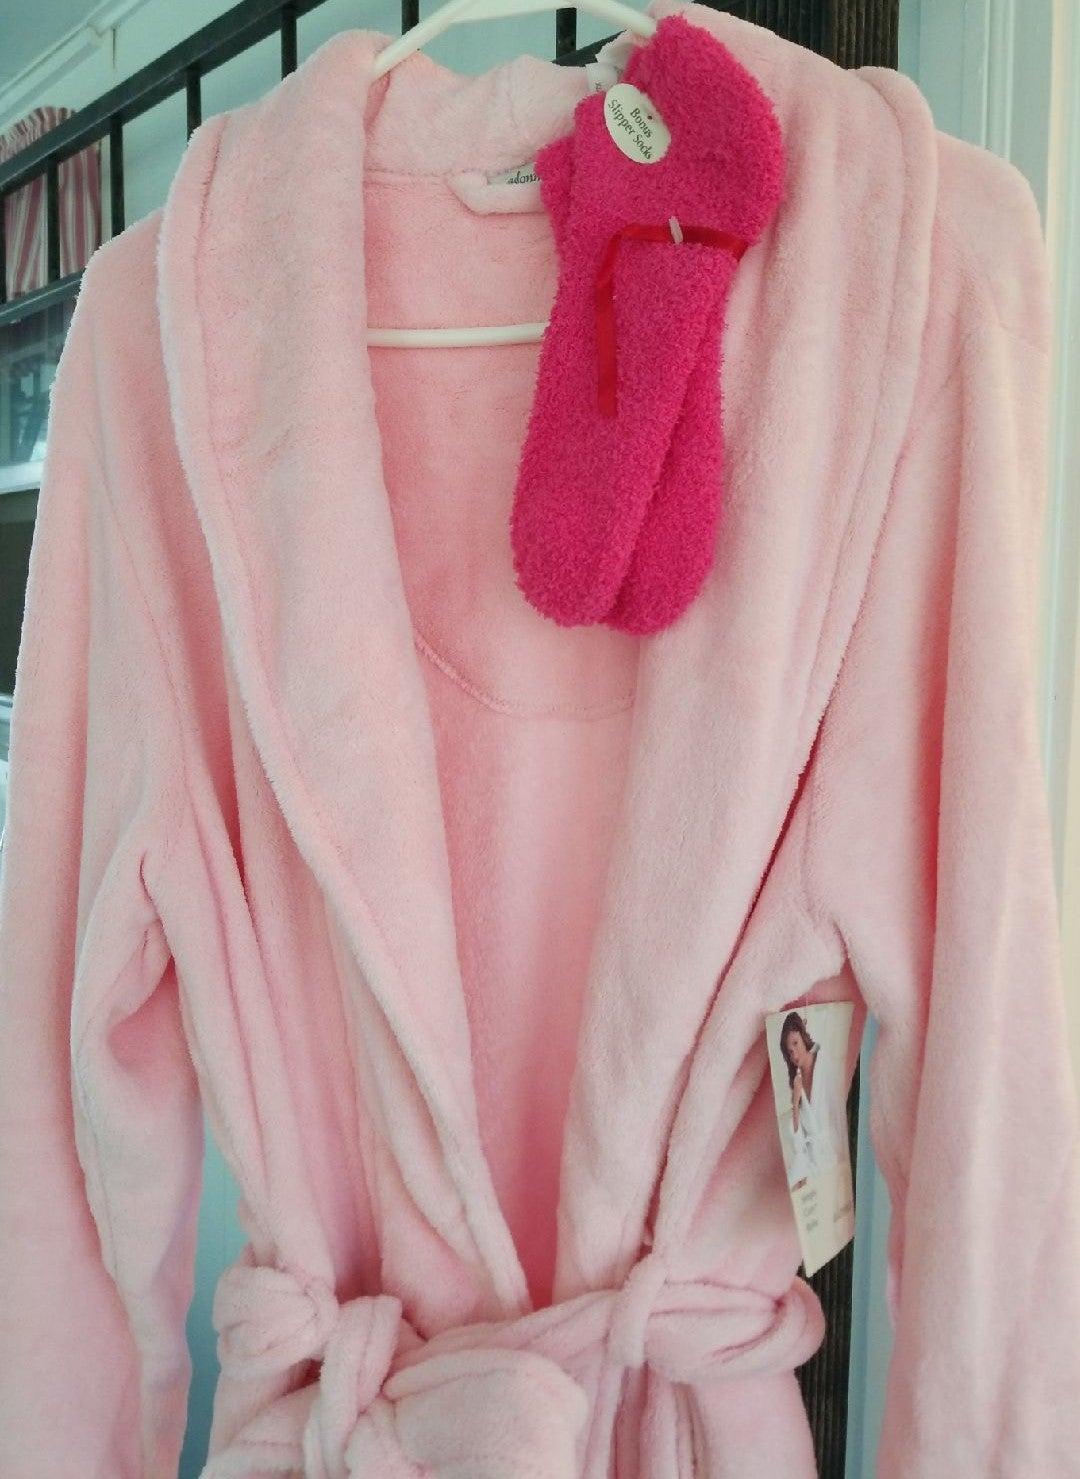 Robe comfy, warm full length robe